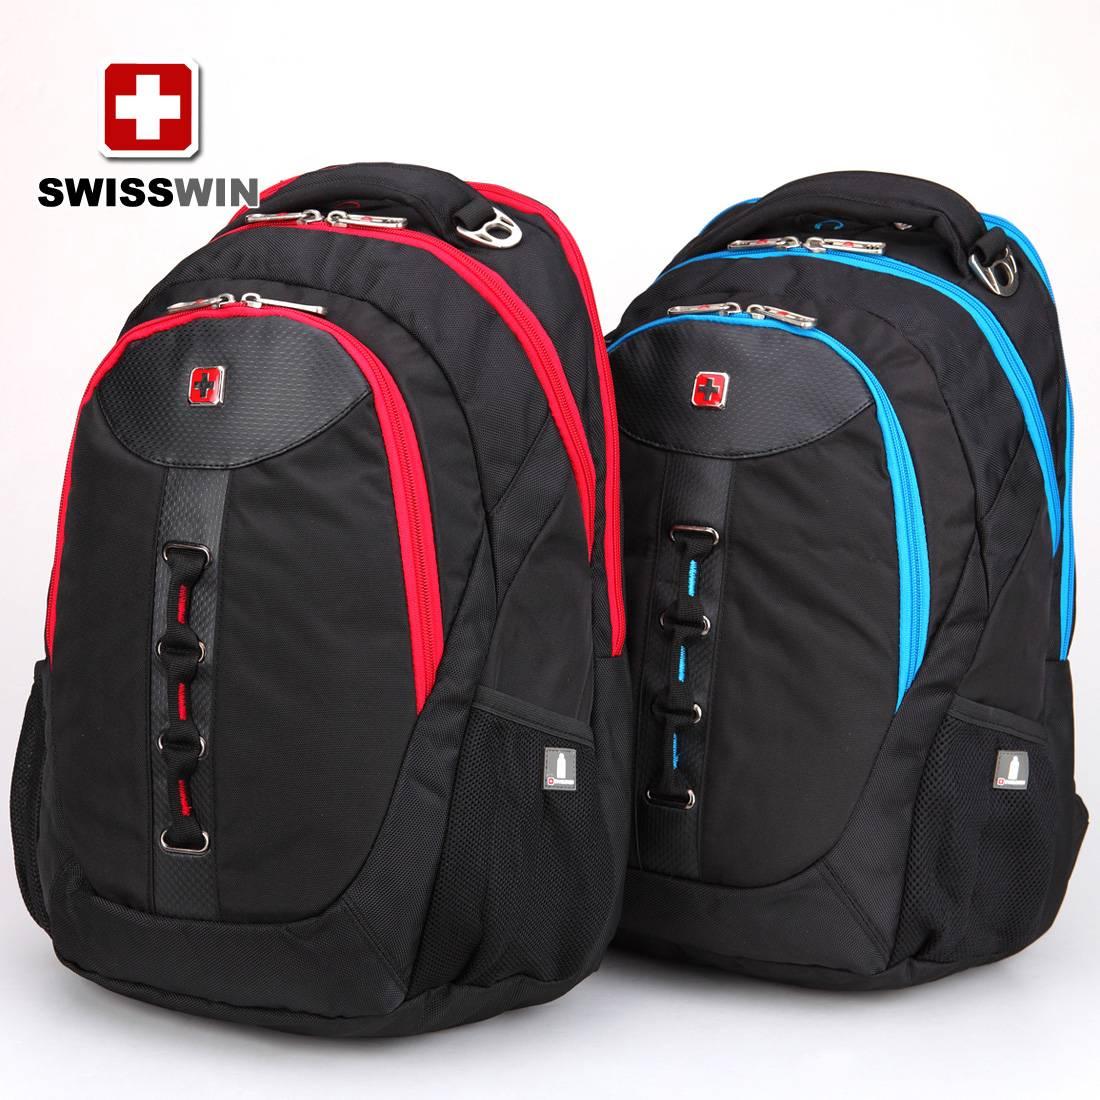 SWISSWIN Army Knife fashion sports men and women shoulder backpack schoolbag backpack